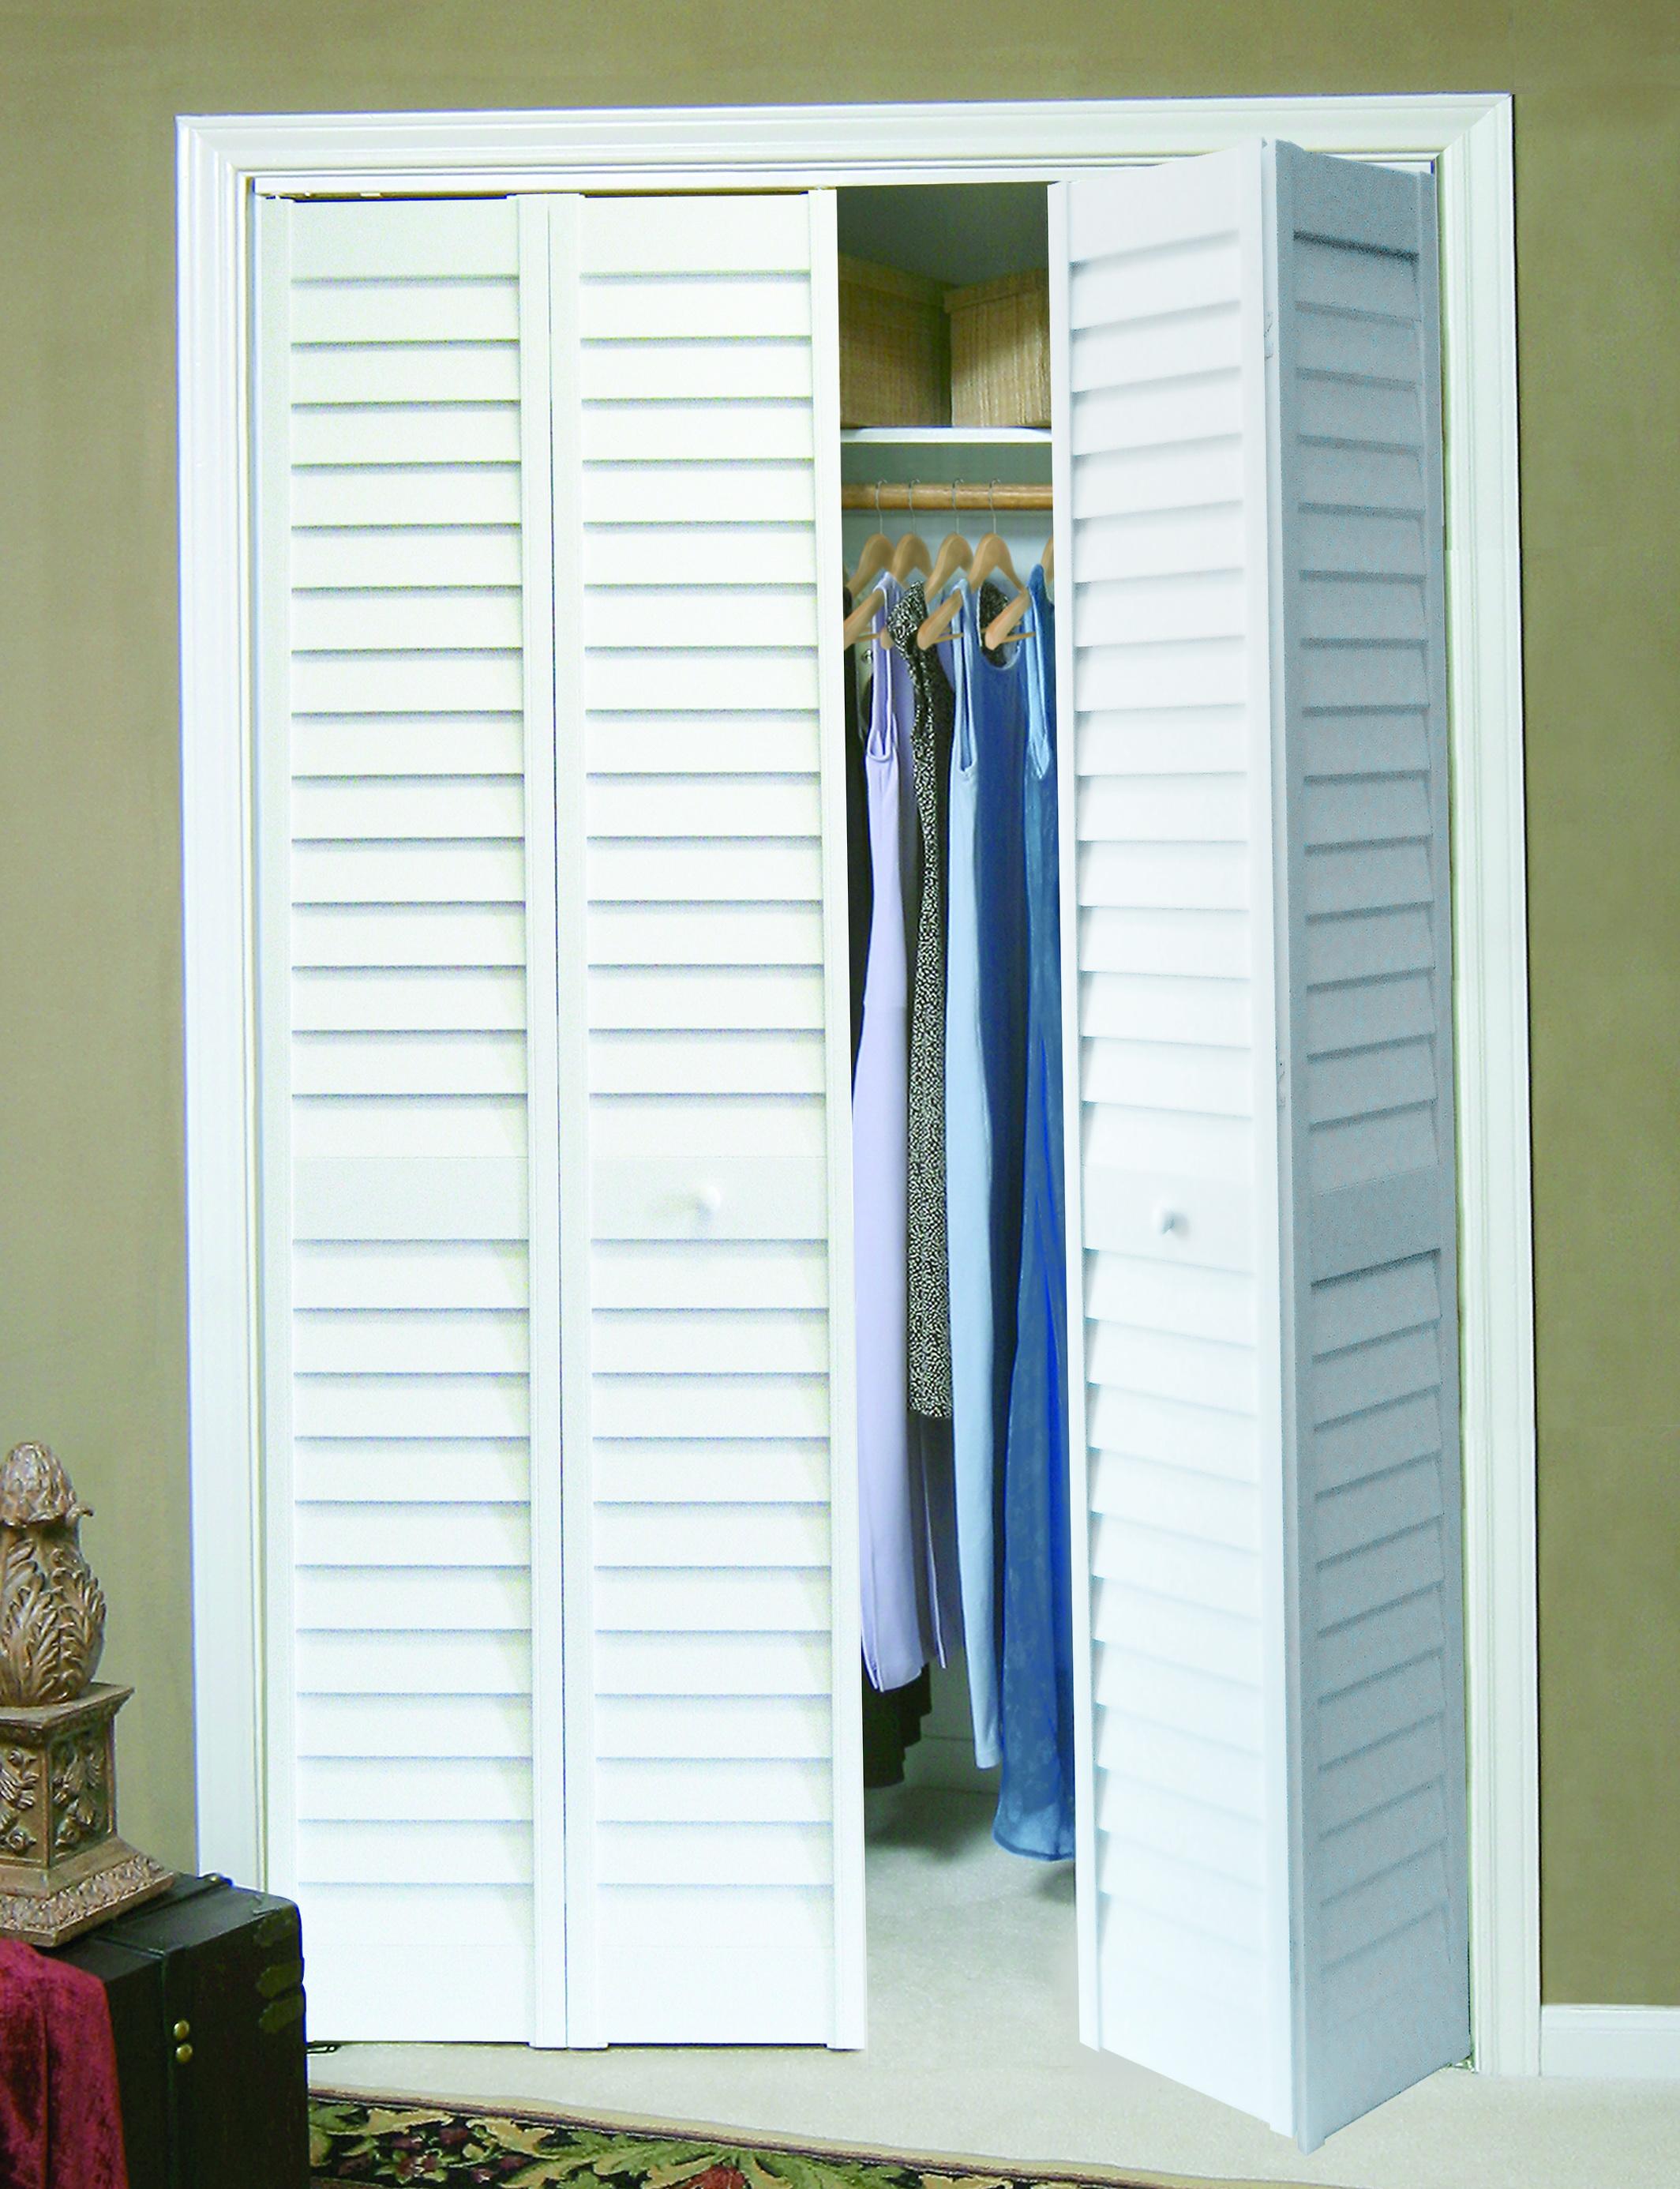 96 inch closet doors canada home design ideas. Black Bedroom Furniture Sets. Home Design Ideas